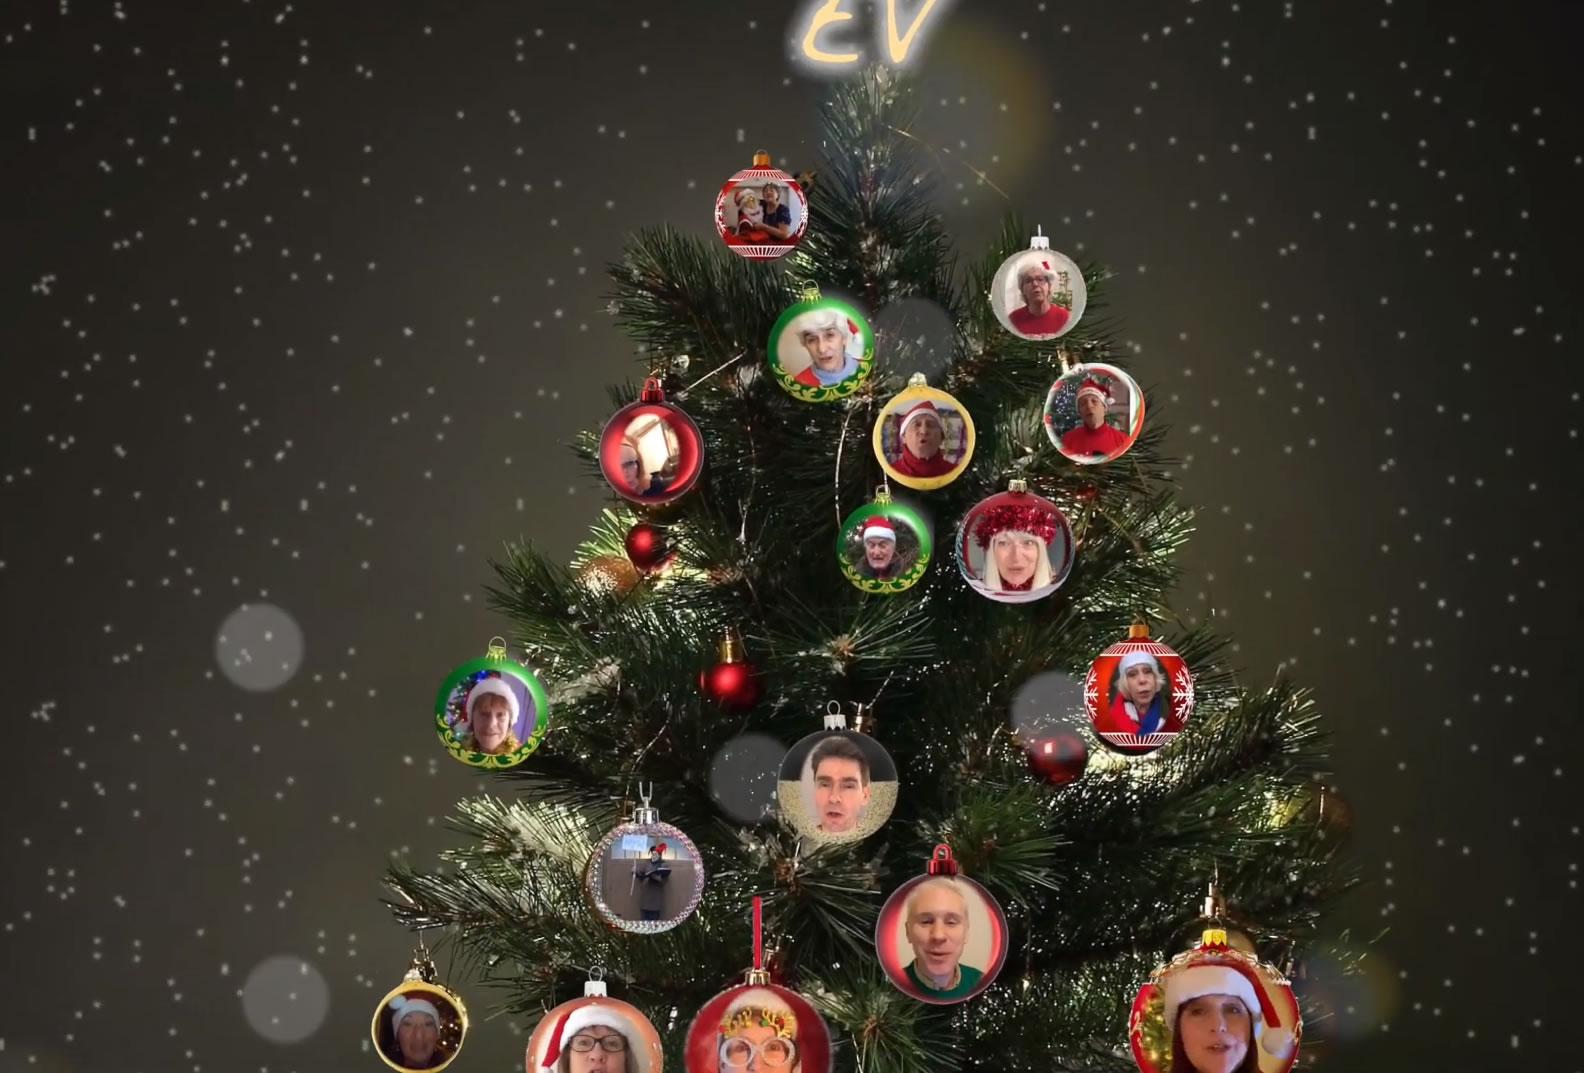 Earthly Voices Choir Cobham Elmbridge - We Wish You A Merry Christmas